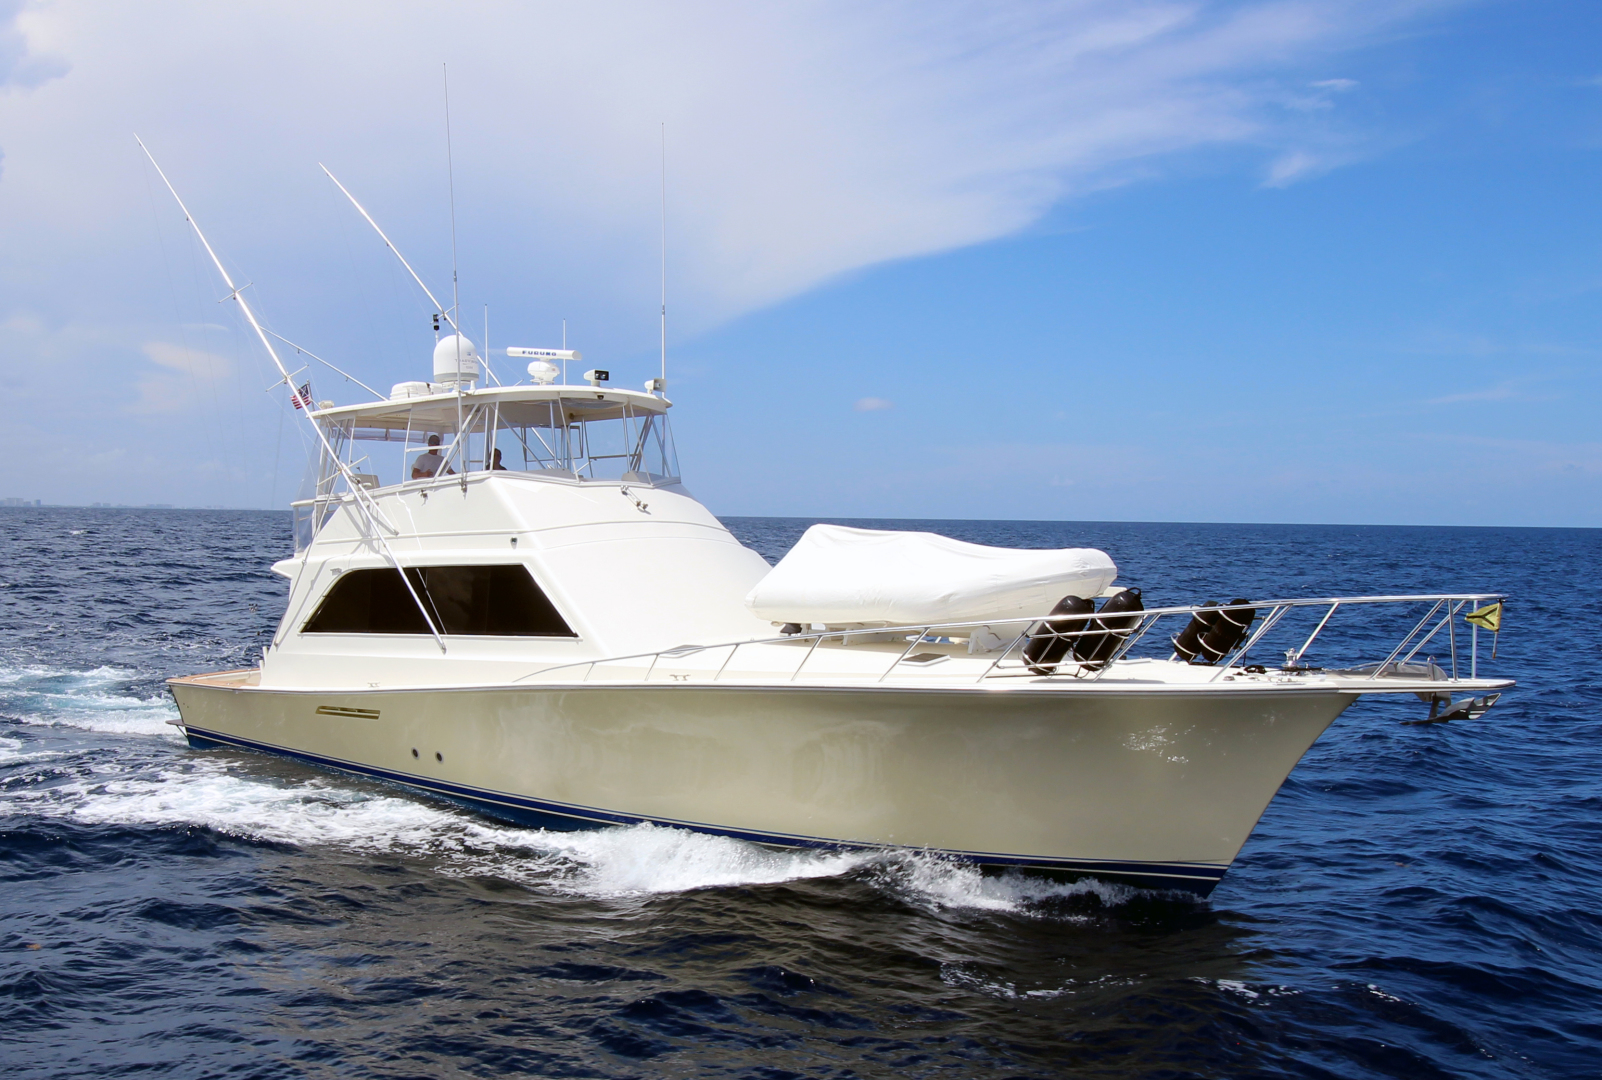 Ocean-Convertible 1989-Coho Ft Lauderdale-Florida-United States-Profile-1418453 | Thumbnail